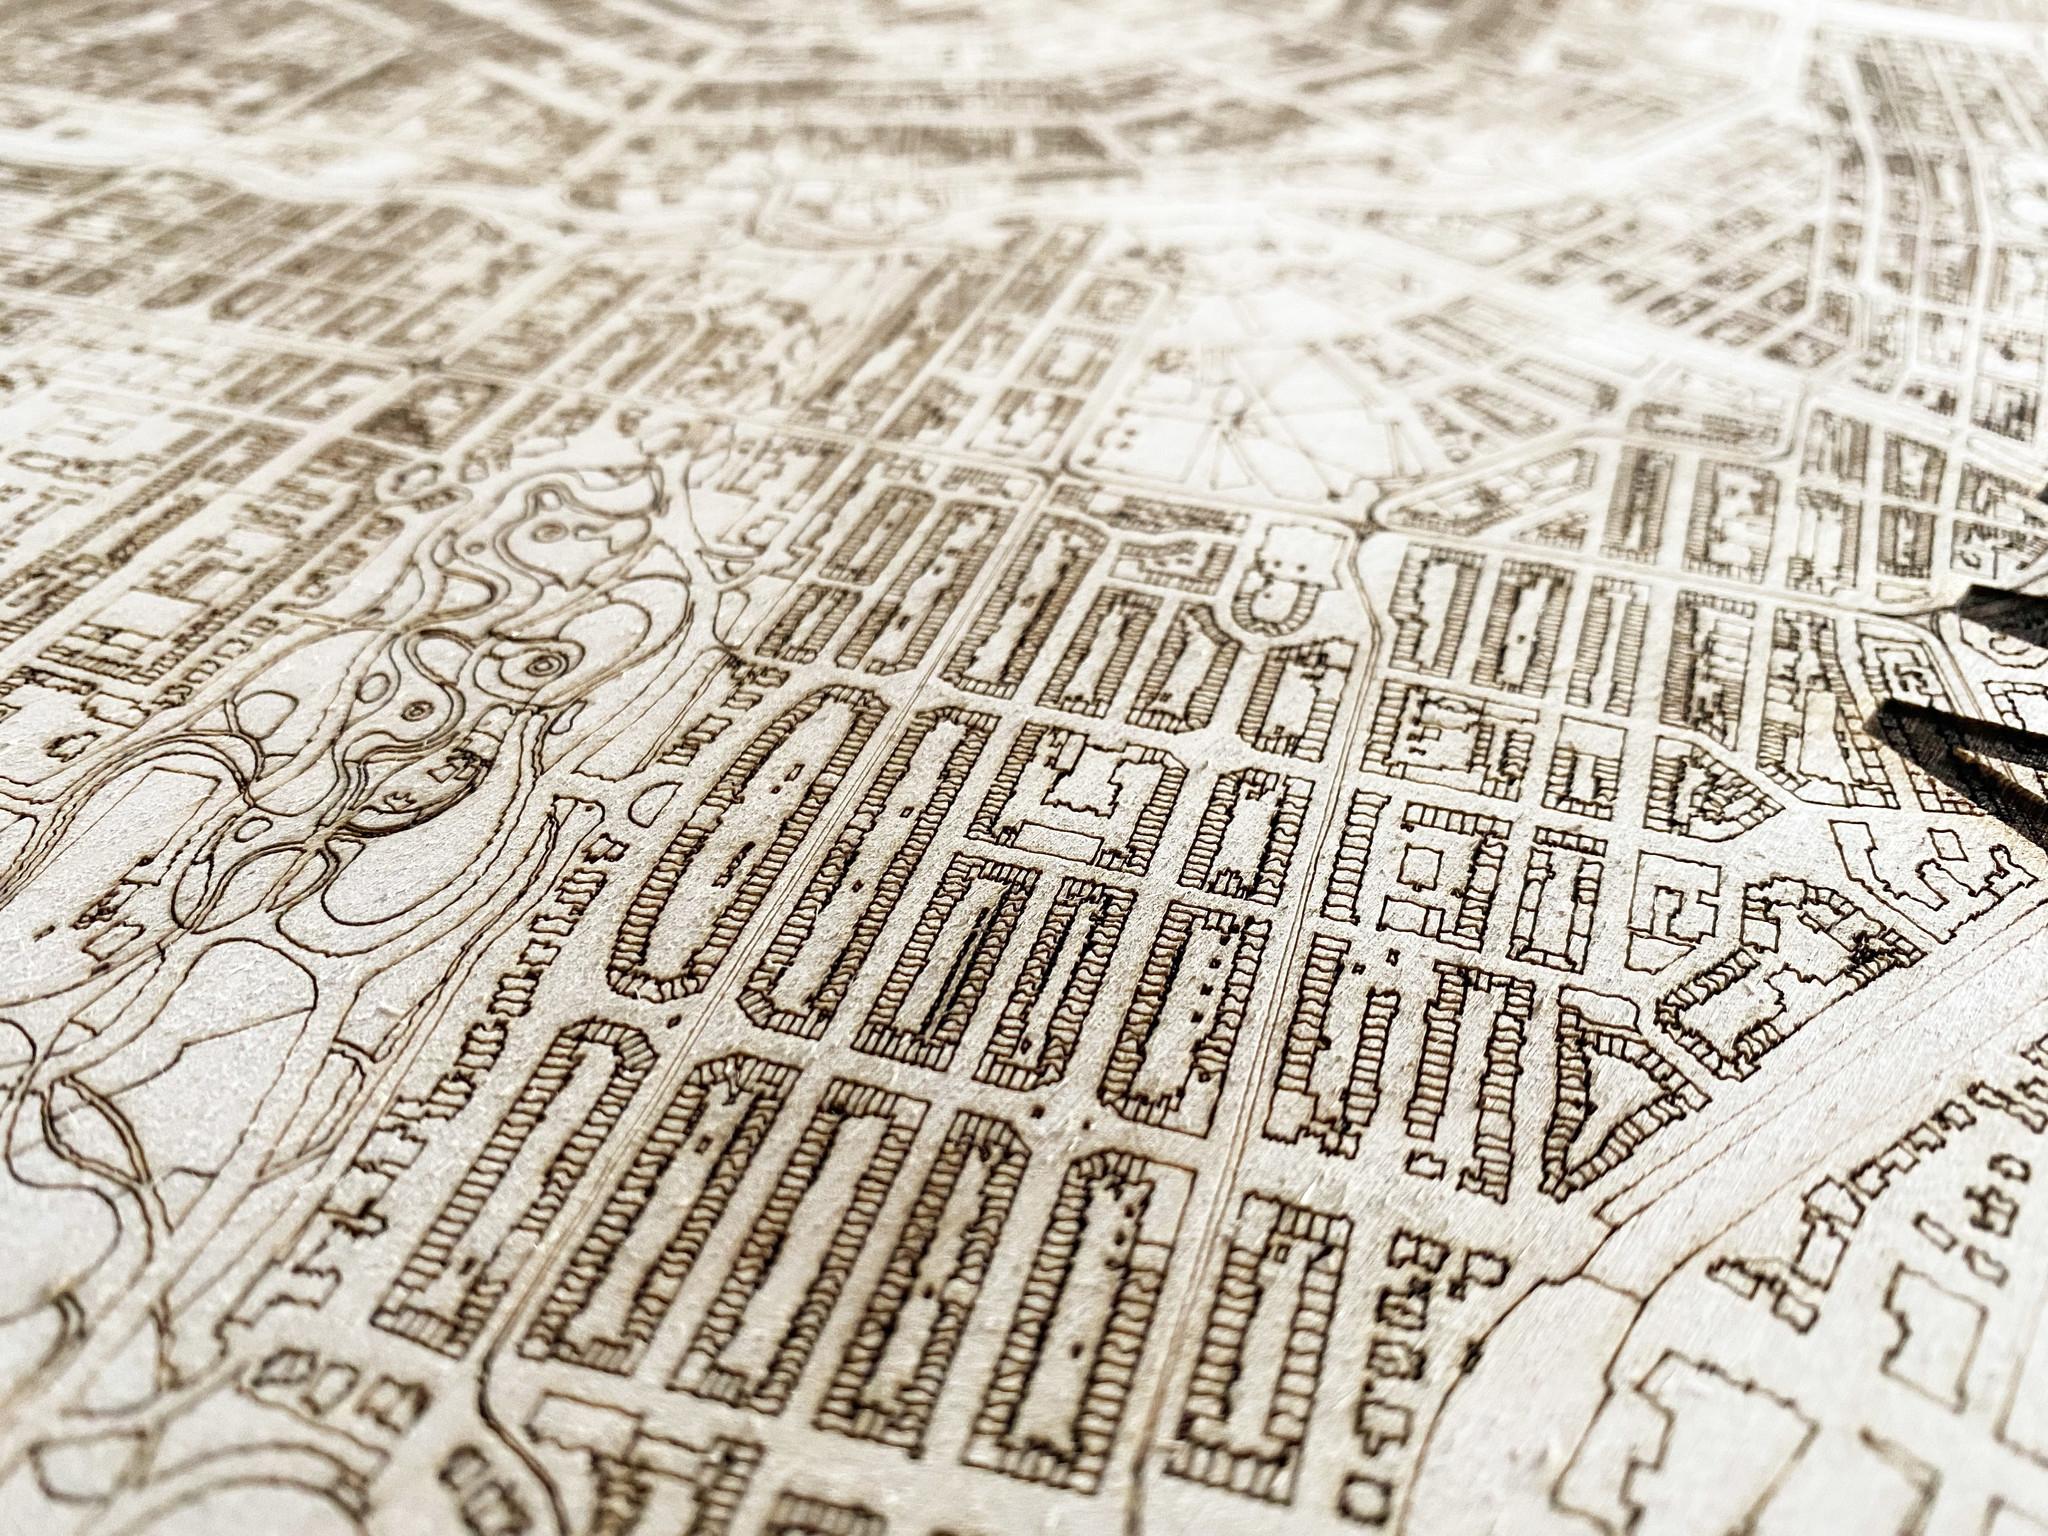 Houten stadsplattegrond Den Bosch-3